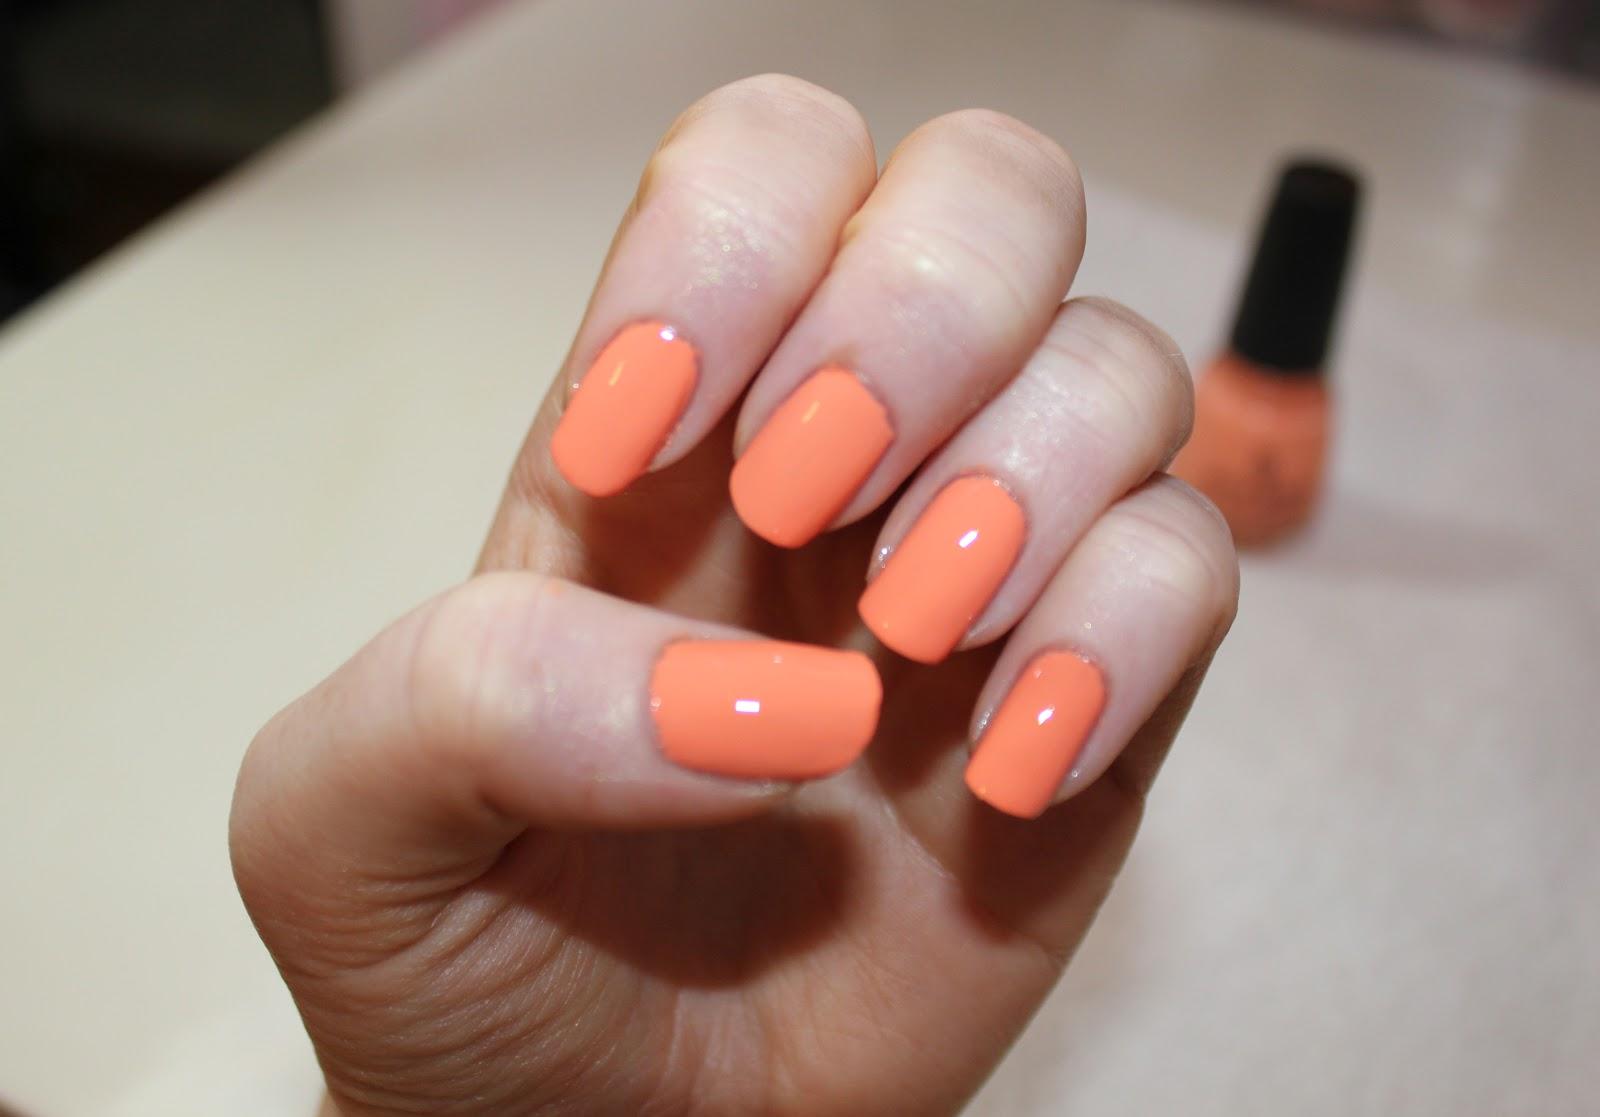 3cba2f133185b Beautybaby44  Nail of the Day  China Glaze Peachy Keen